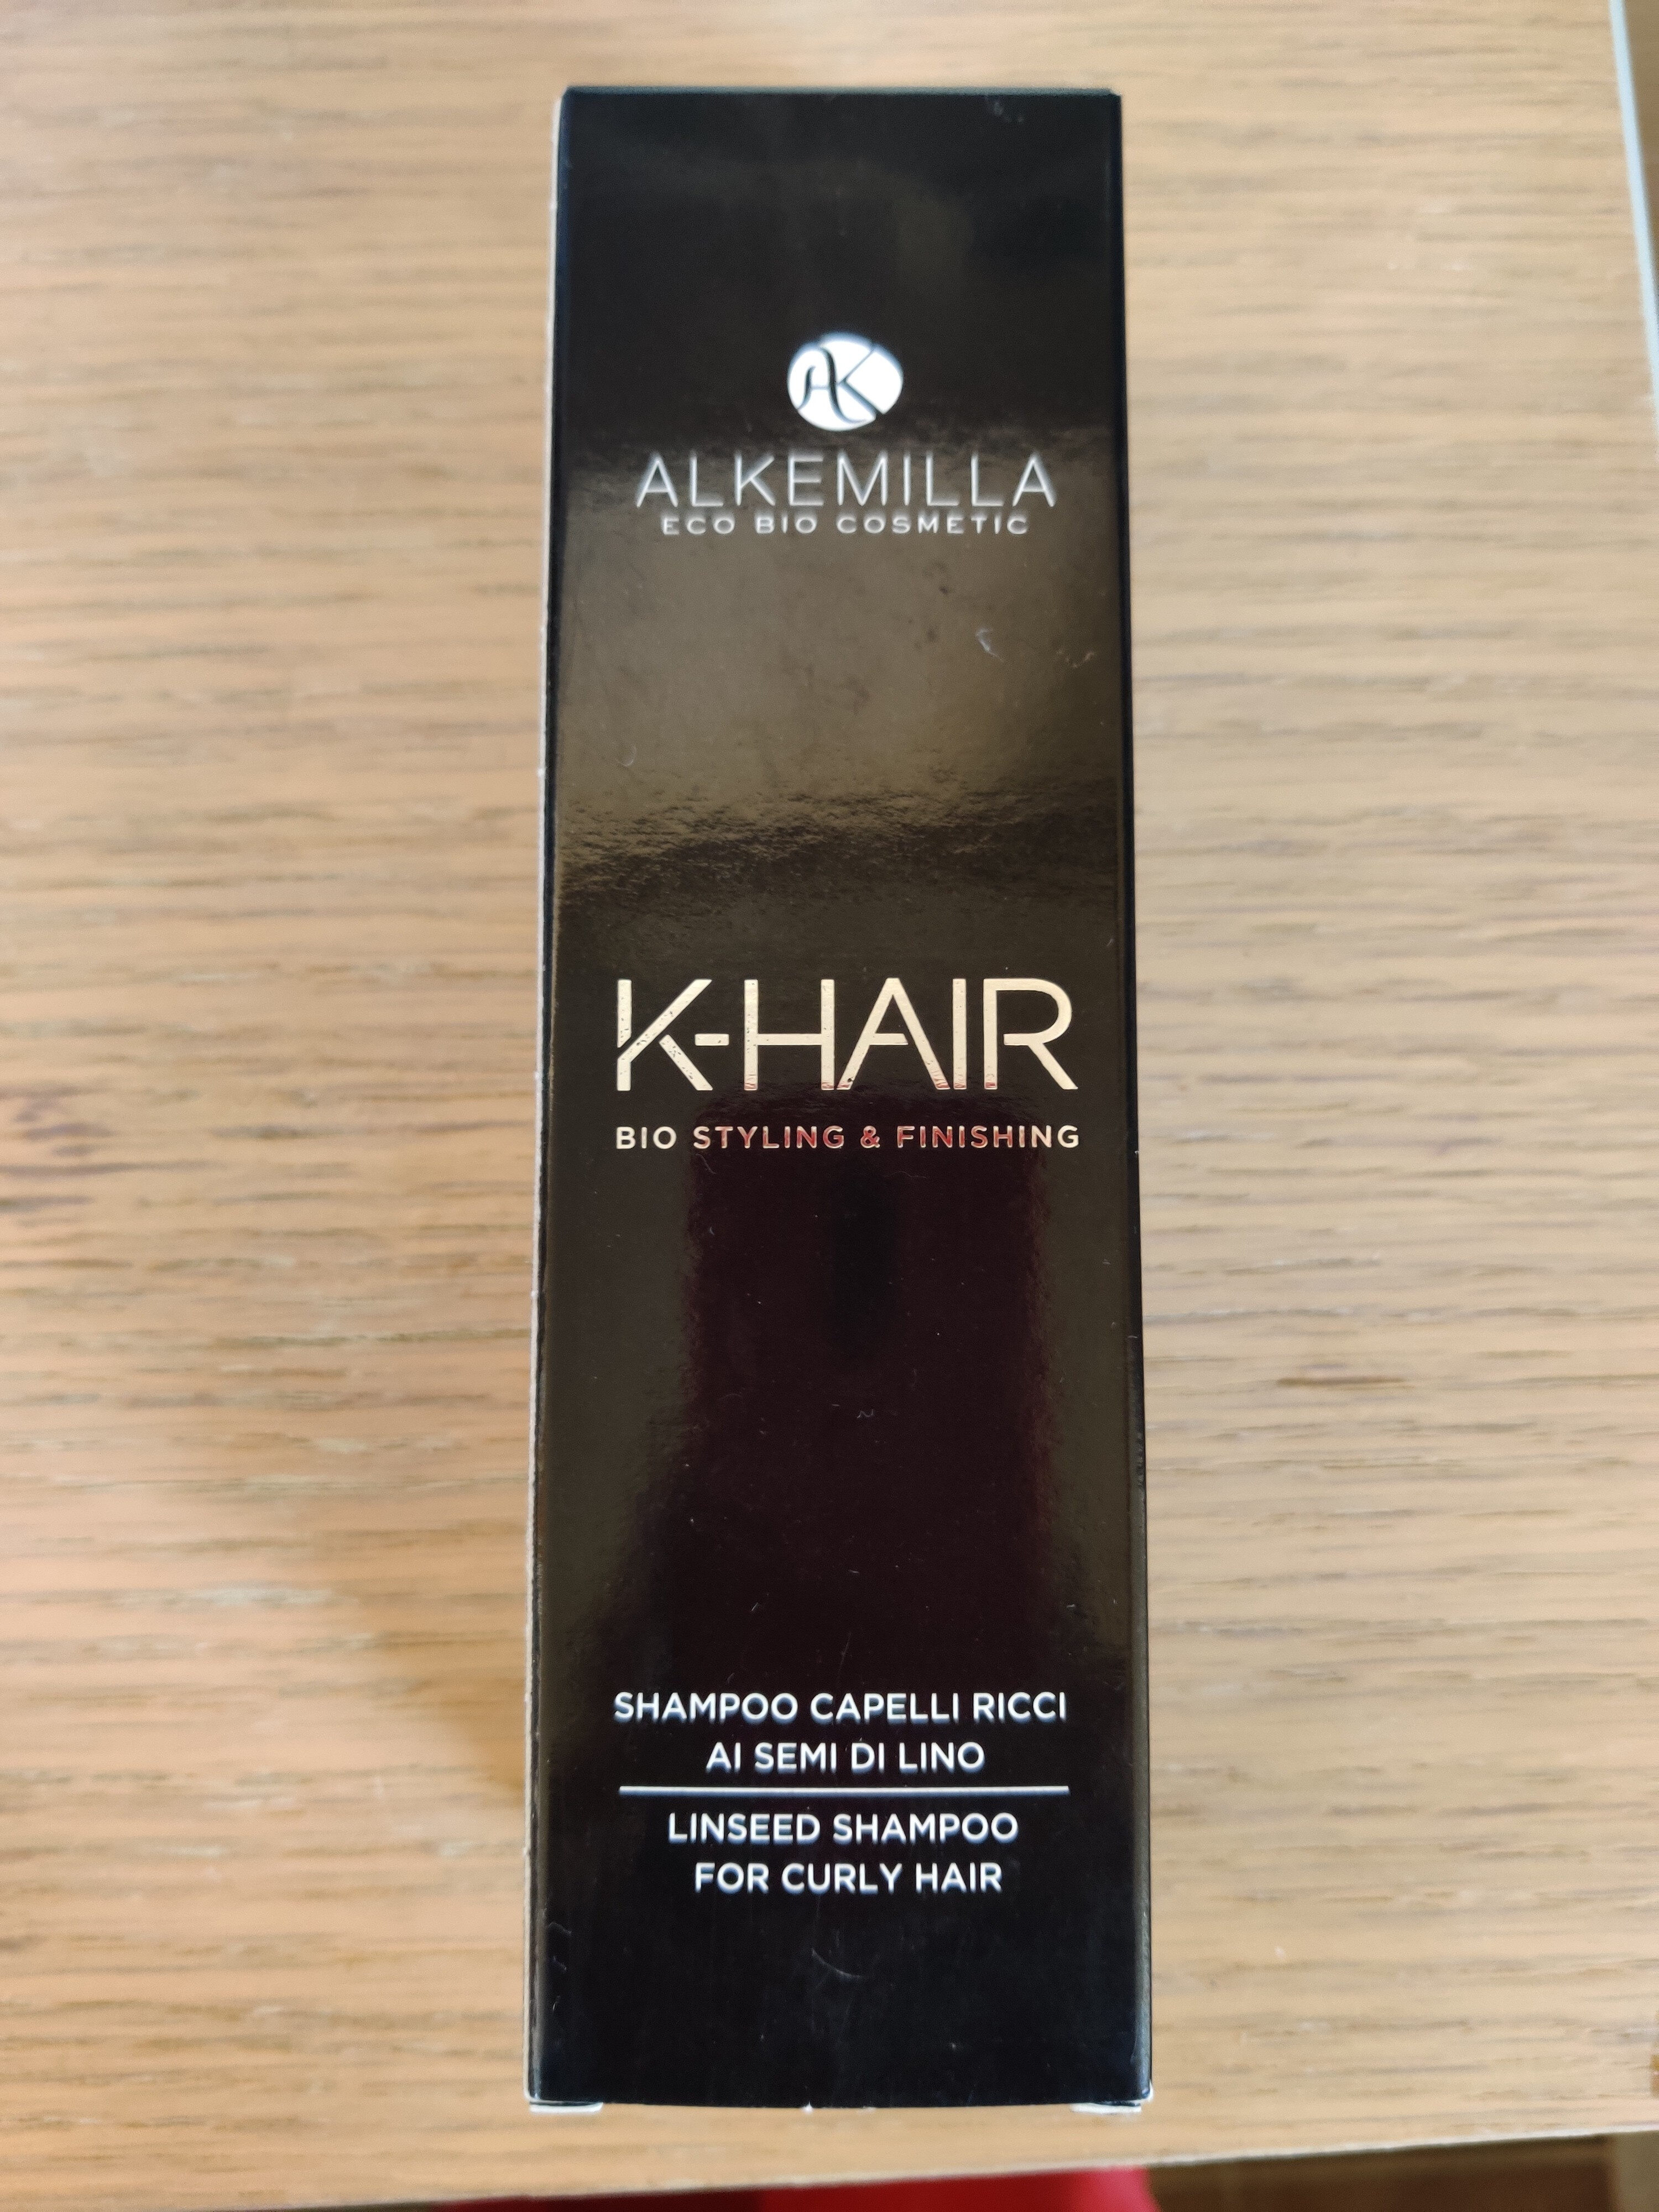 shampoo capelli ricci - Product - it